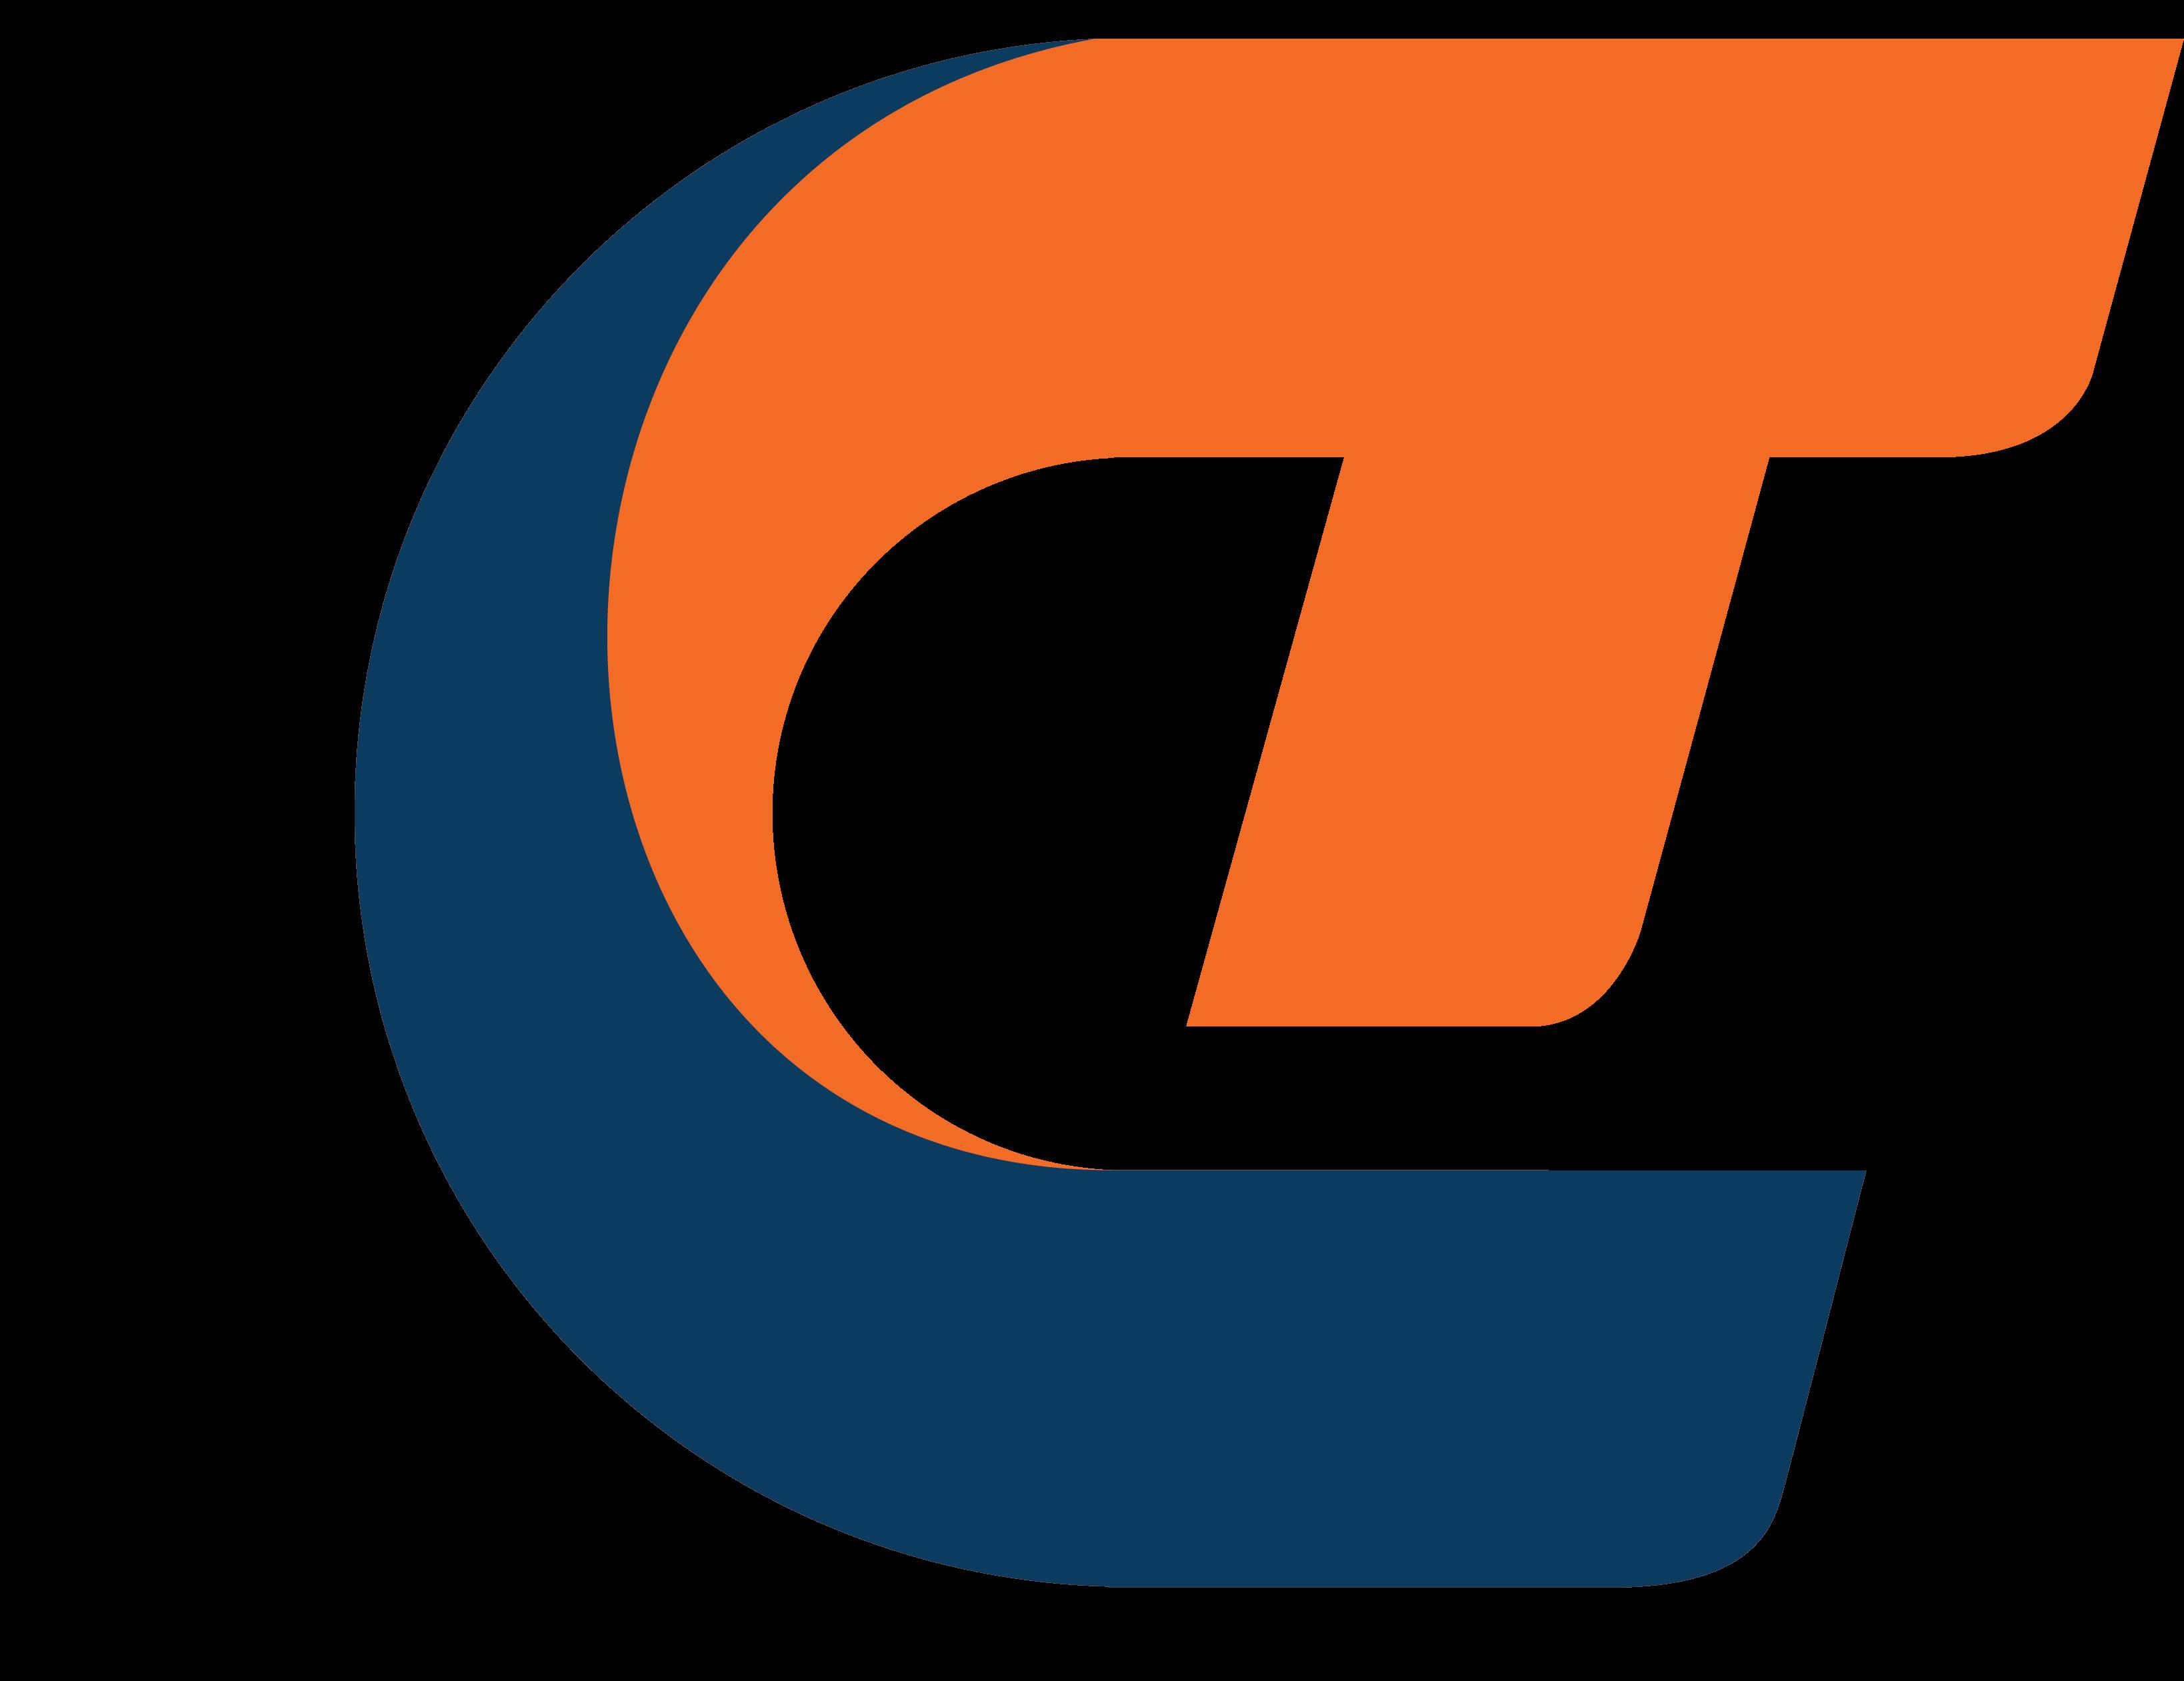 Cleanline Tasman Ltd